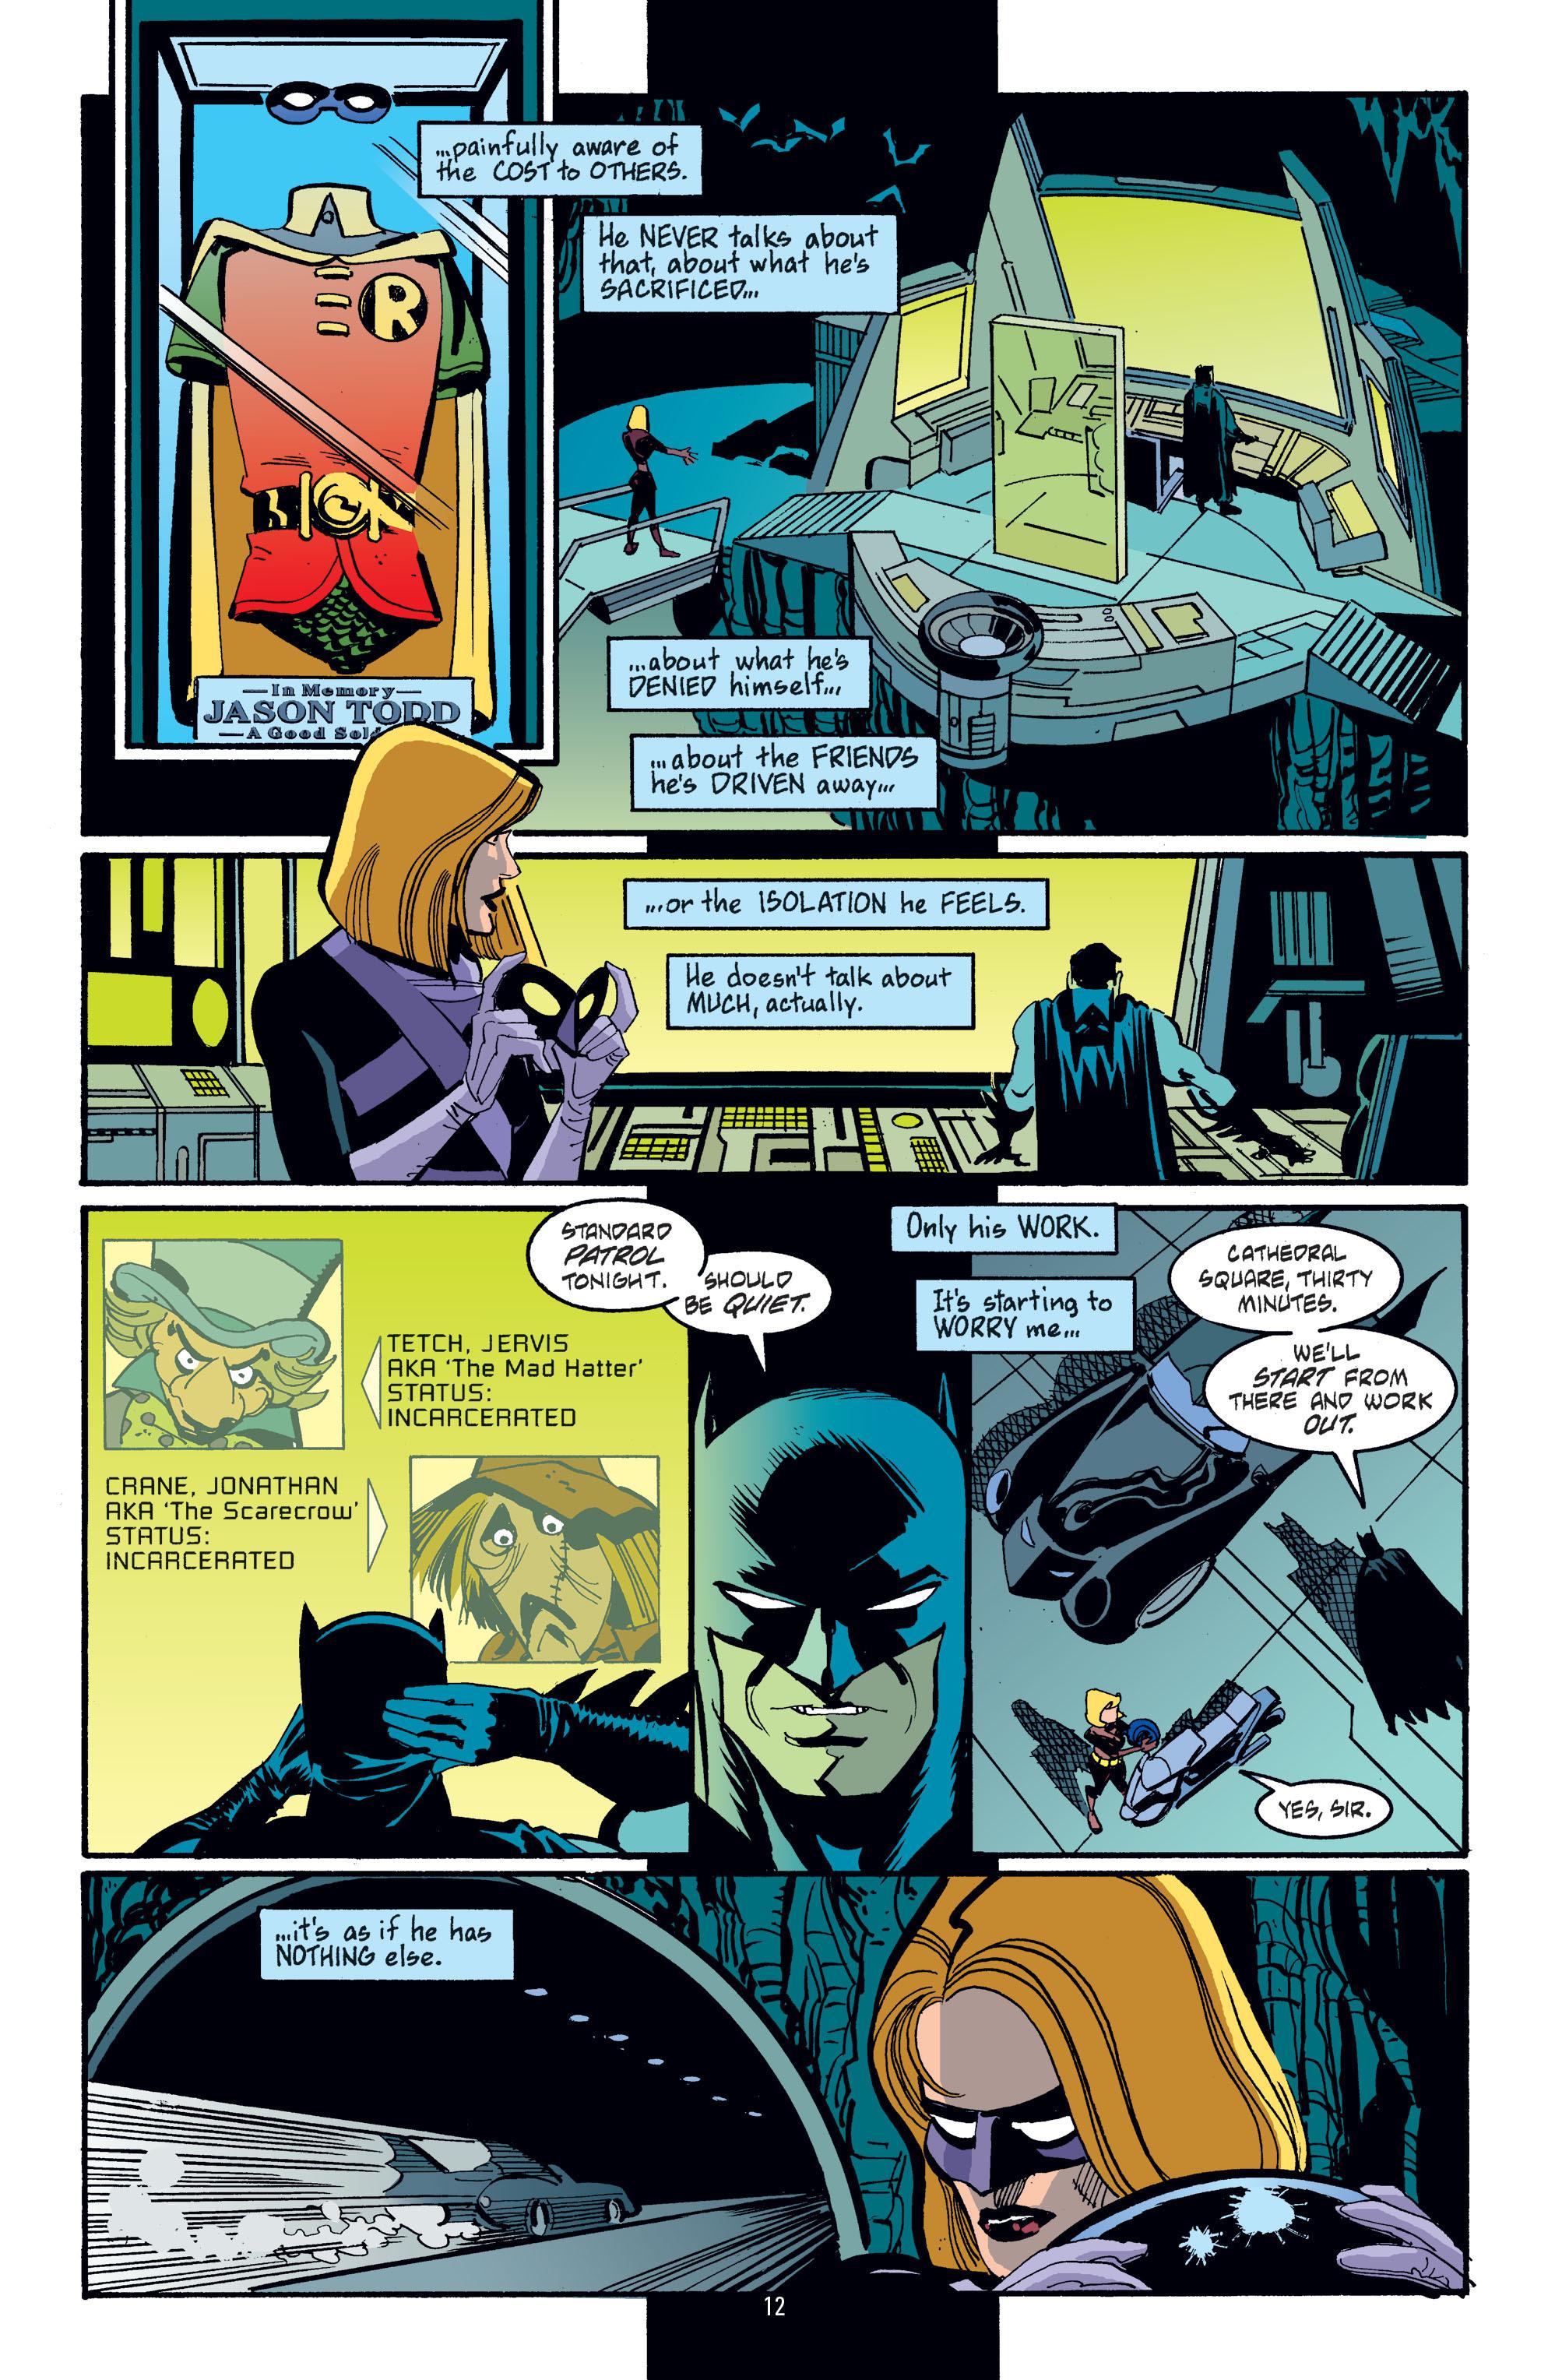 Psychology of Bruce Wayne K0wp1pLe-tWym3PkPlPYu-0F1ZpnaCvk1KwBtNT8HUEEH1A_G8XKOAggC99Z-9ggTyMFn99D3jvf=s0